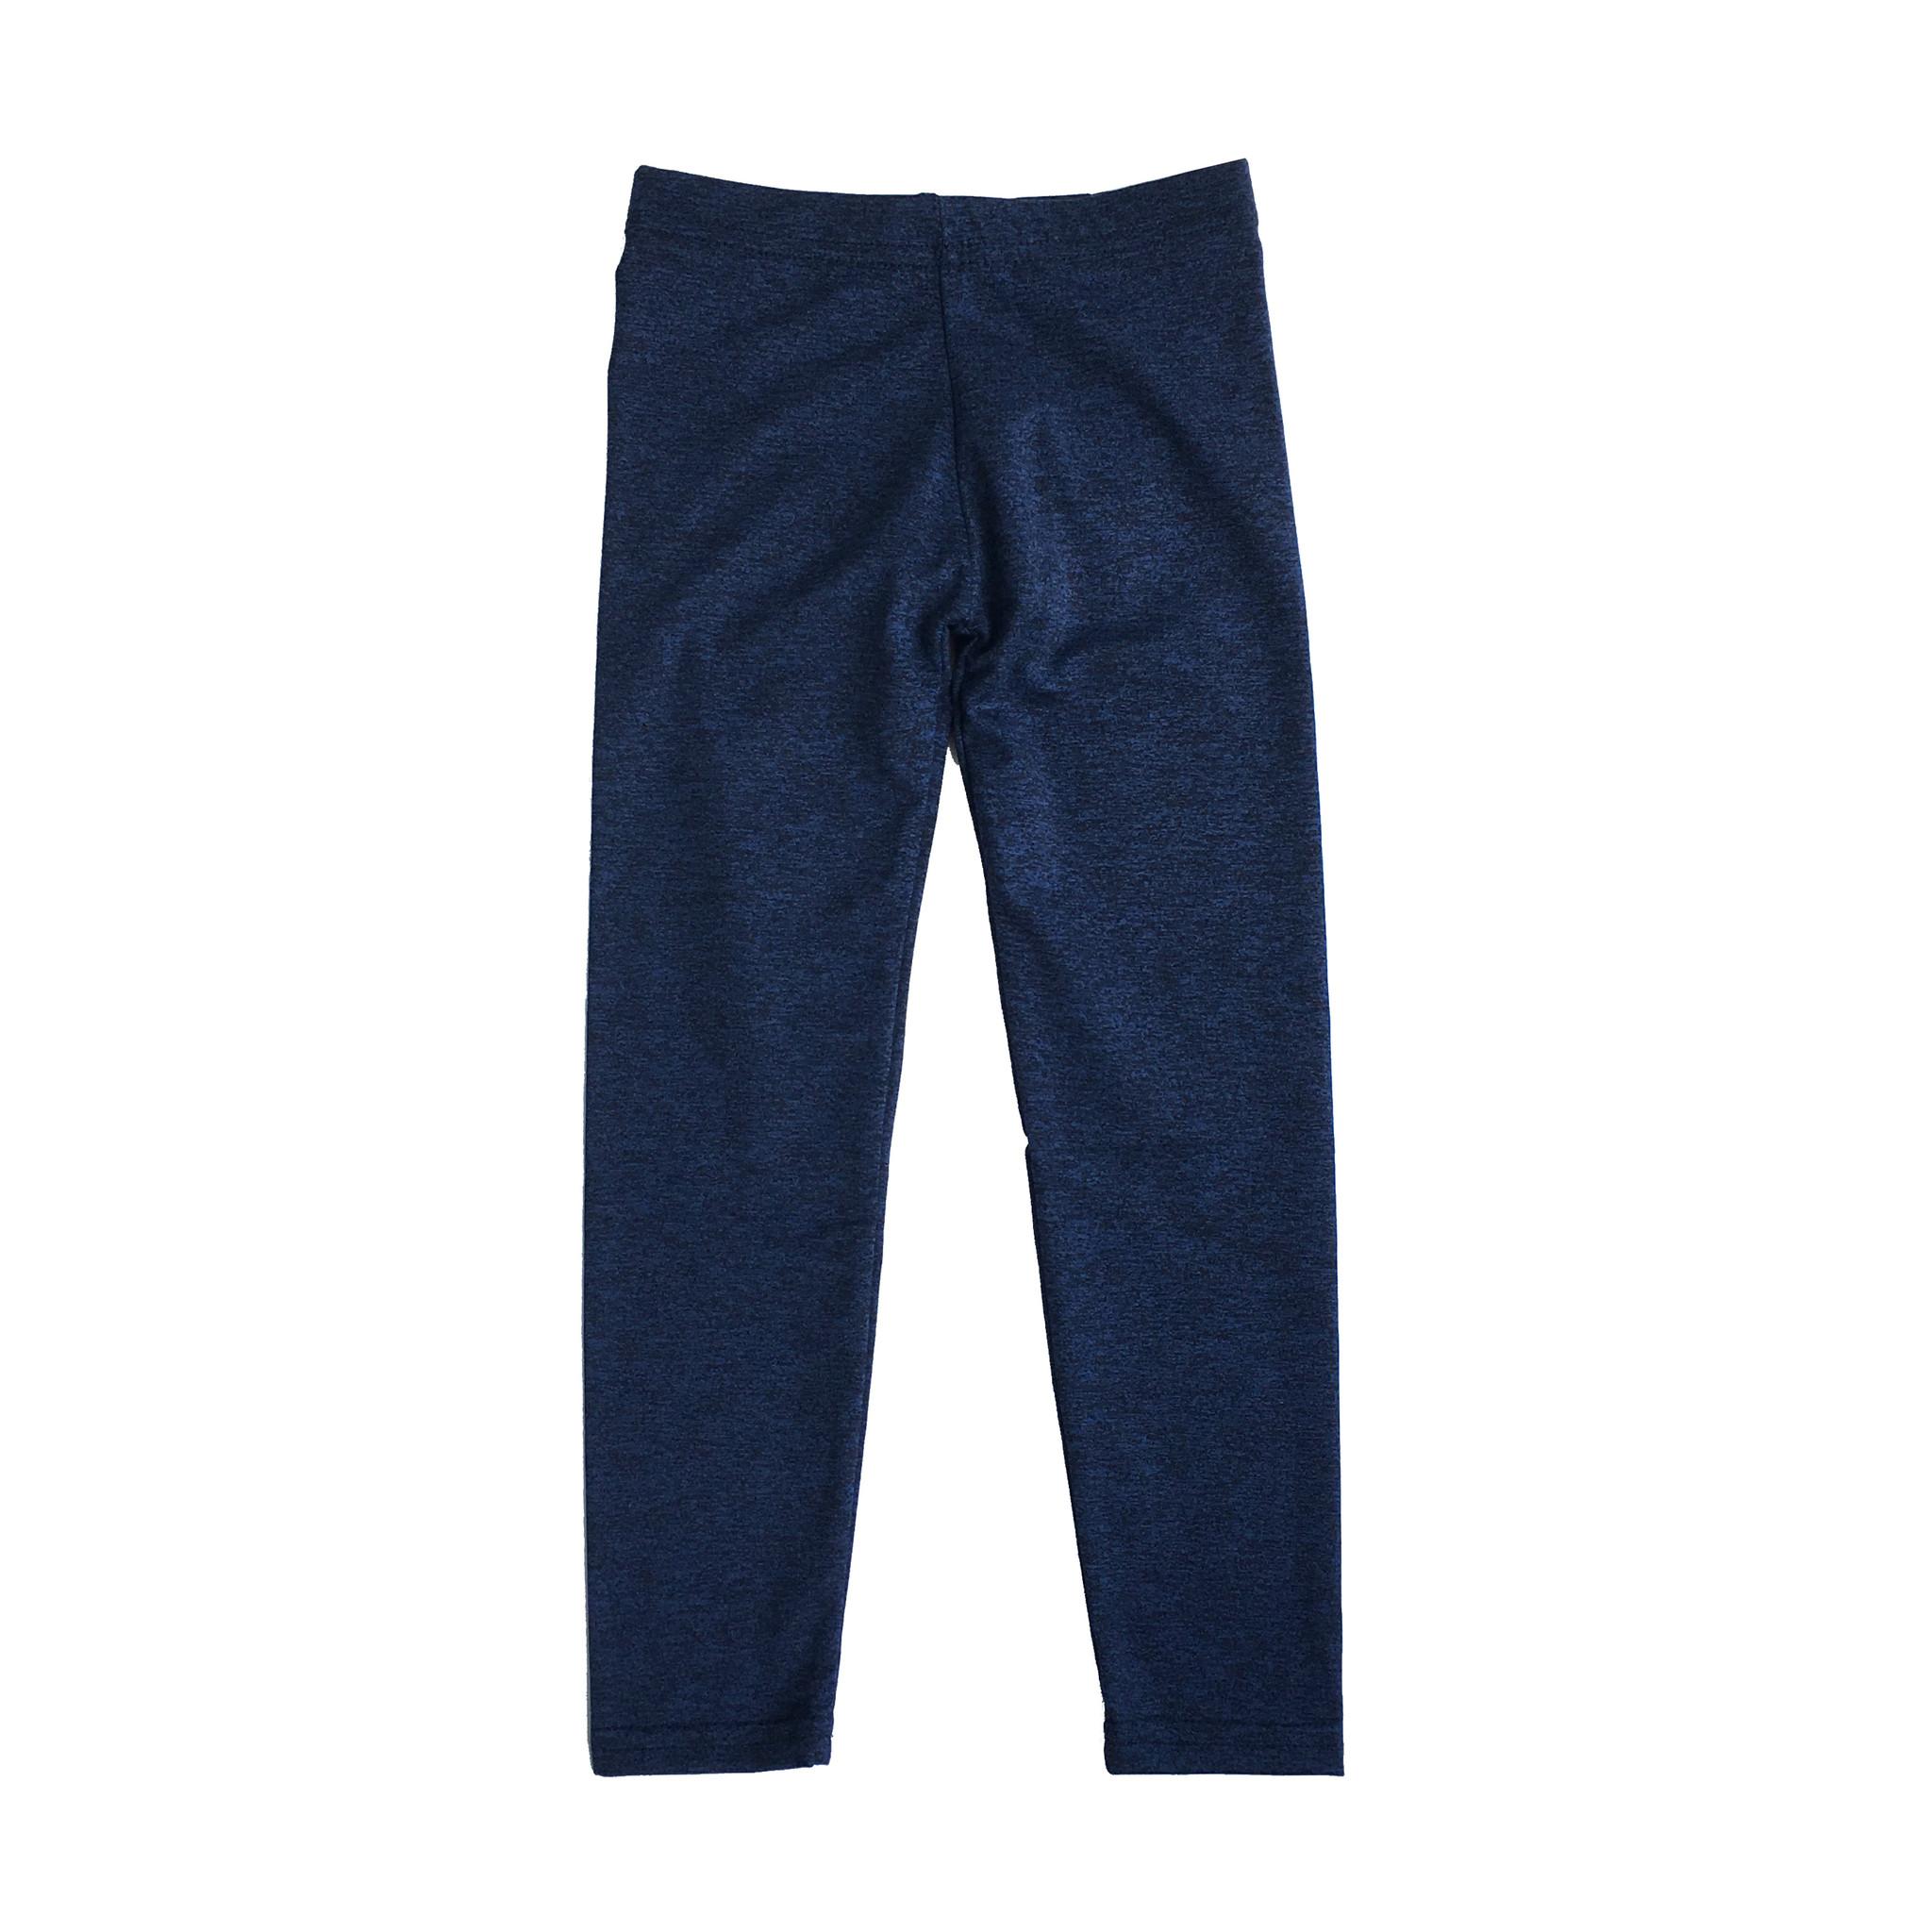 Dori Creations Navy/Black Heathered Junior Legging